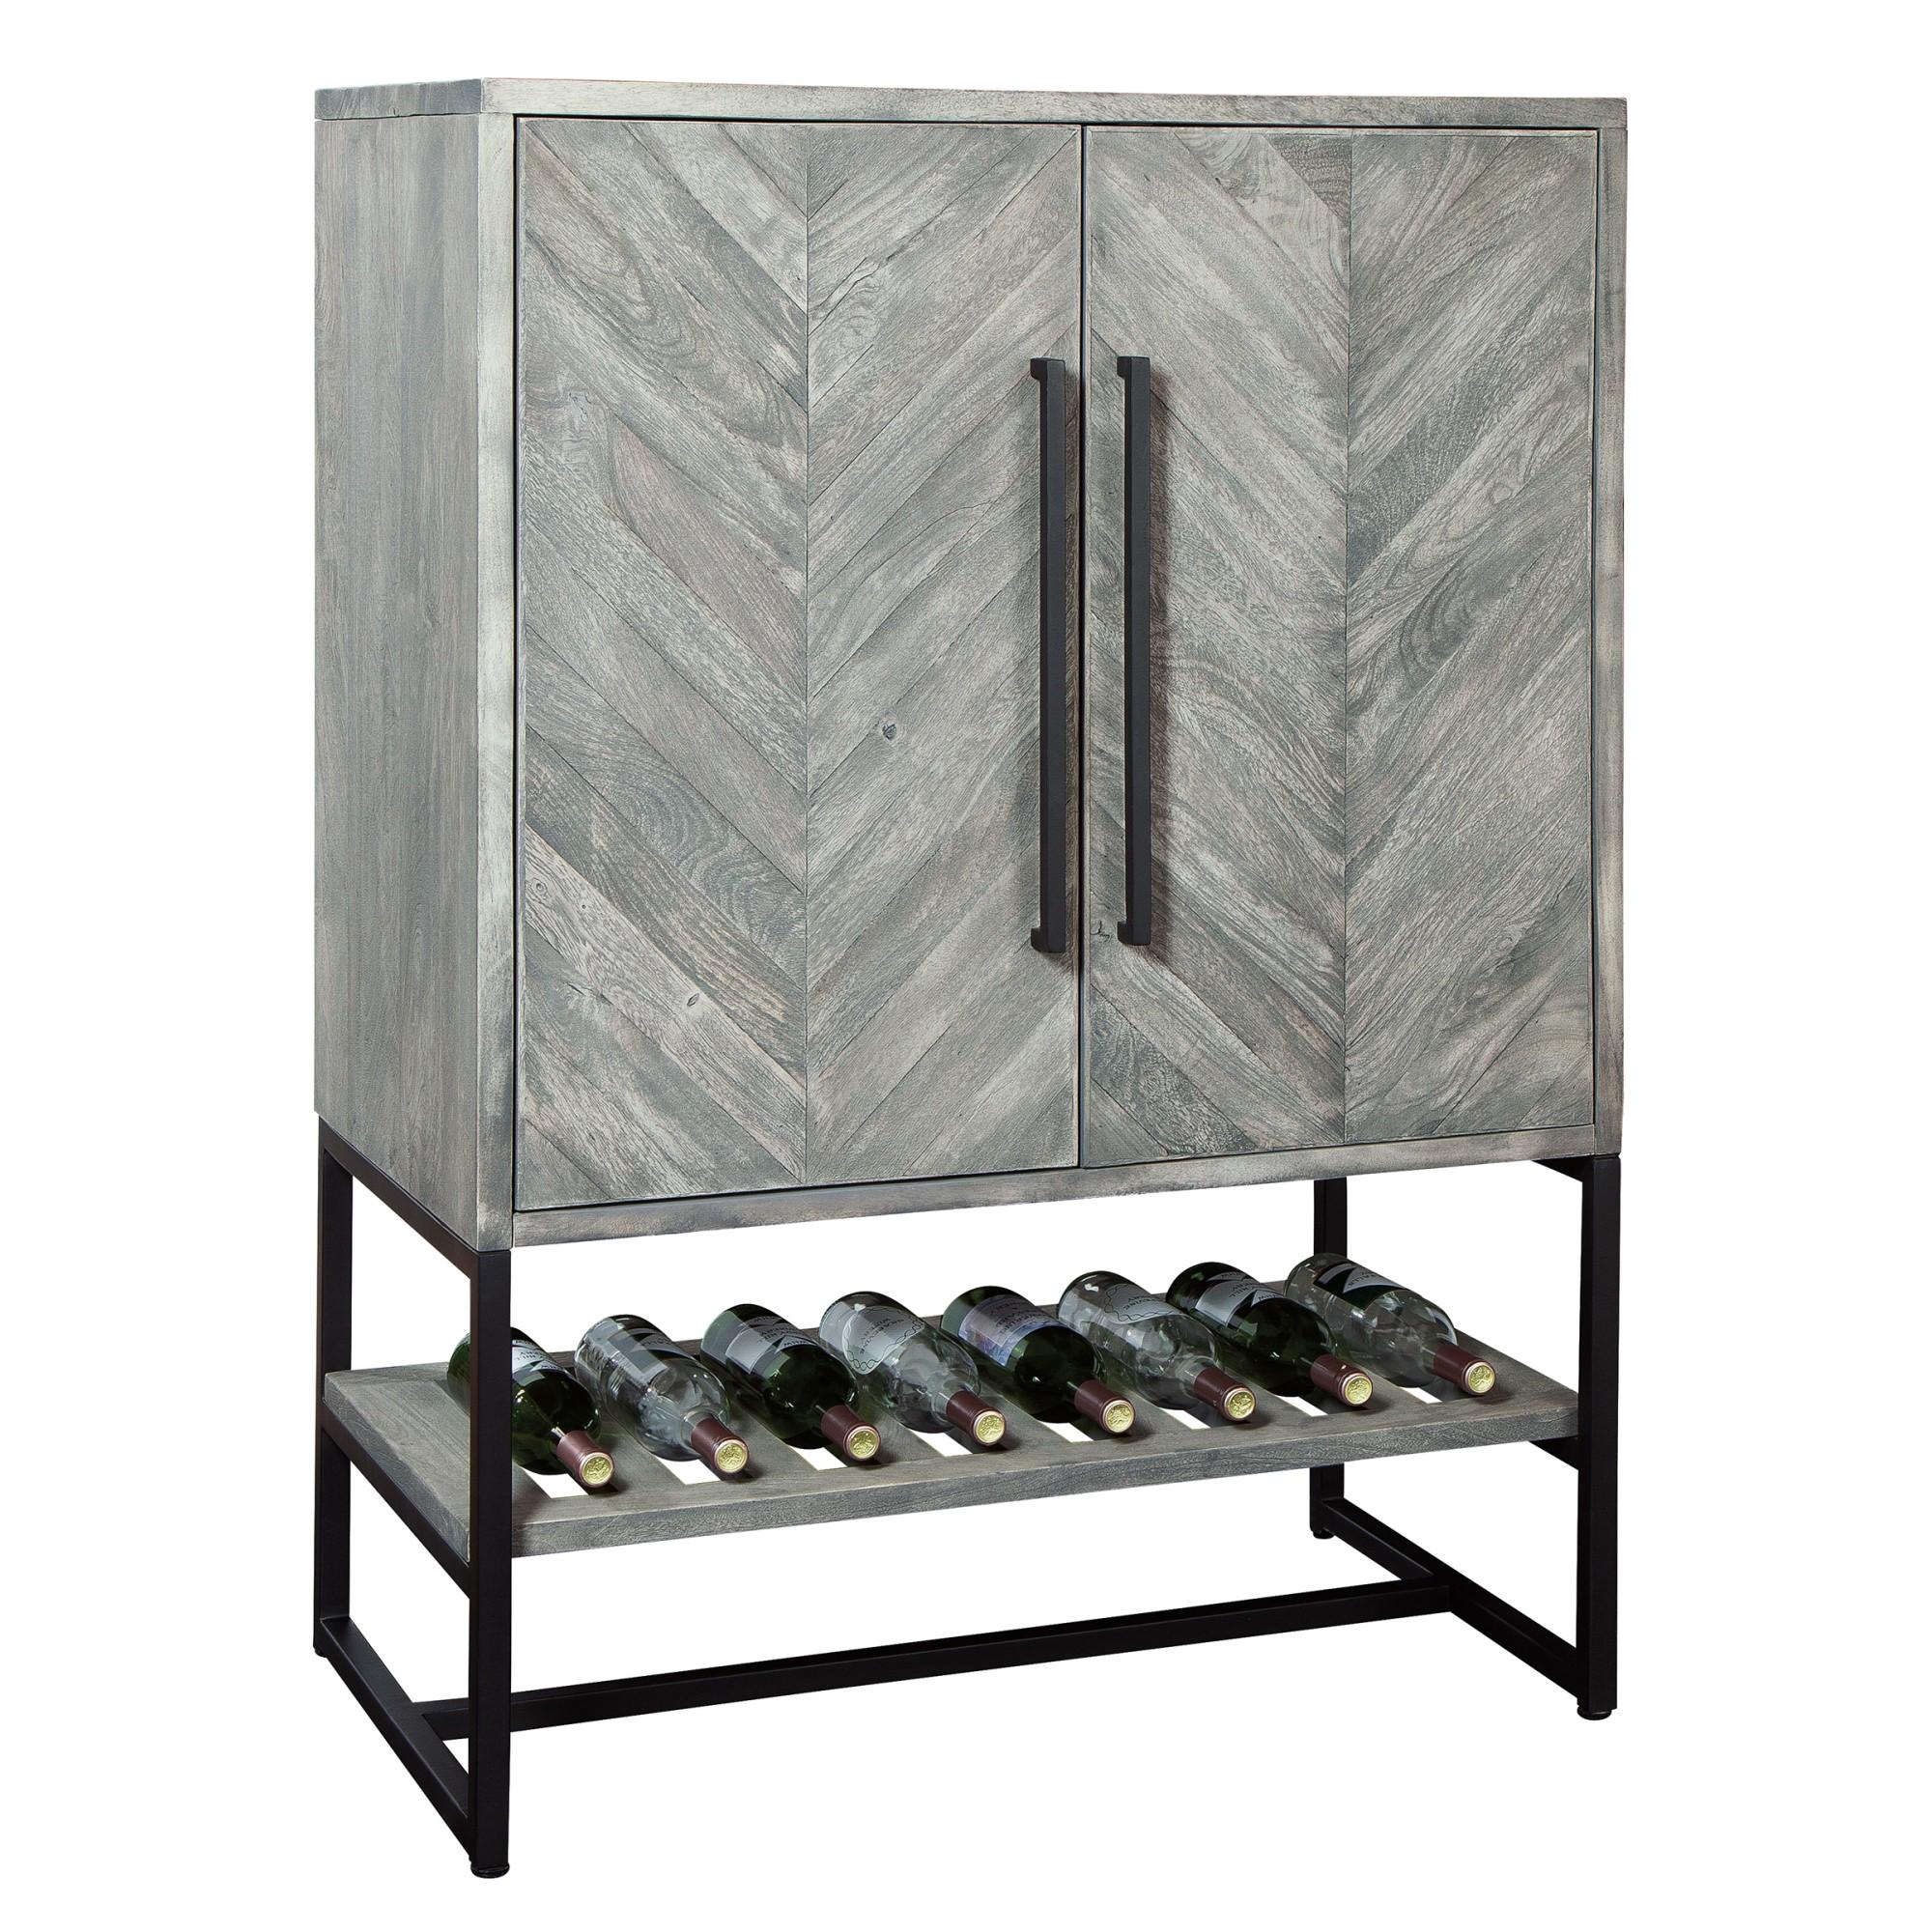 Image for 695-226 Jamaica Inn Wine & Bar Cabinet from Howard Miller Official Website